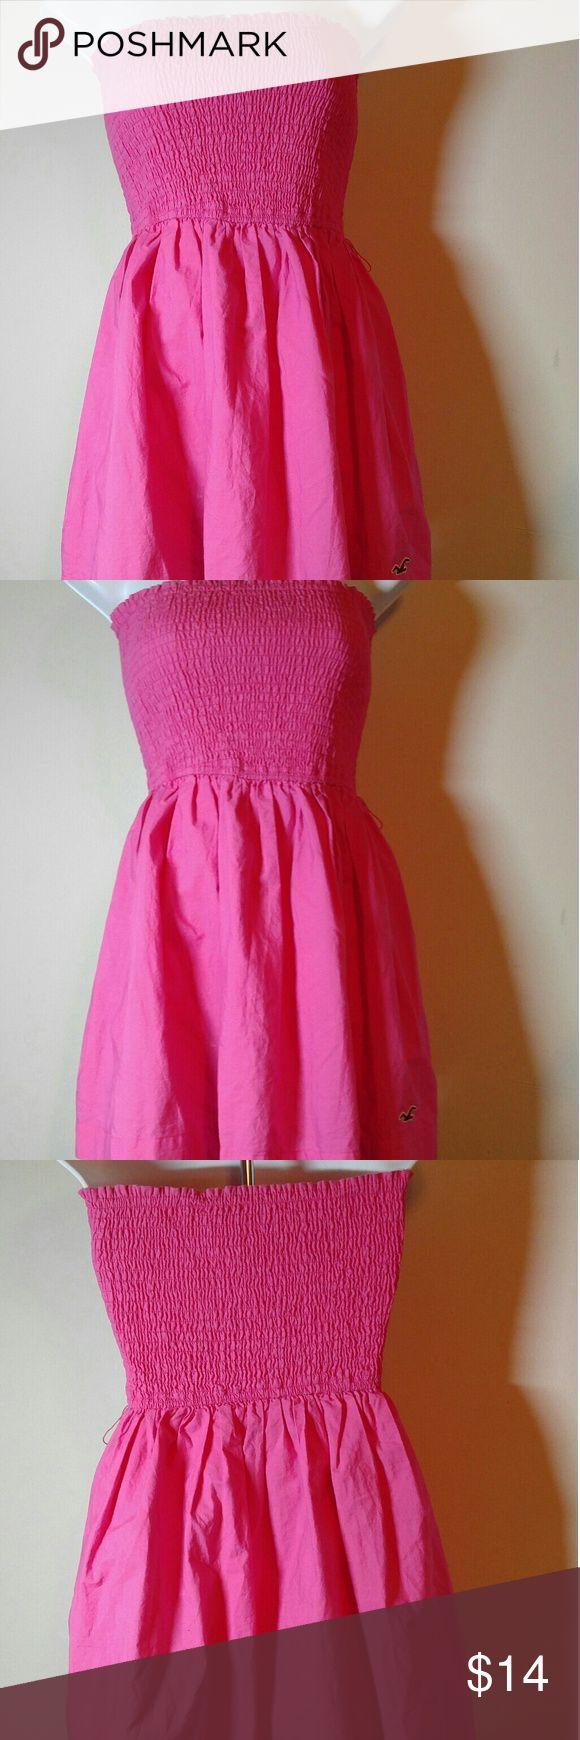 Hollister Strapless Summer Dress Sz Medium Hollister Dress -23 inches in length from the bust line to Hem-Like New! Hollister Dresses